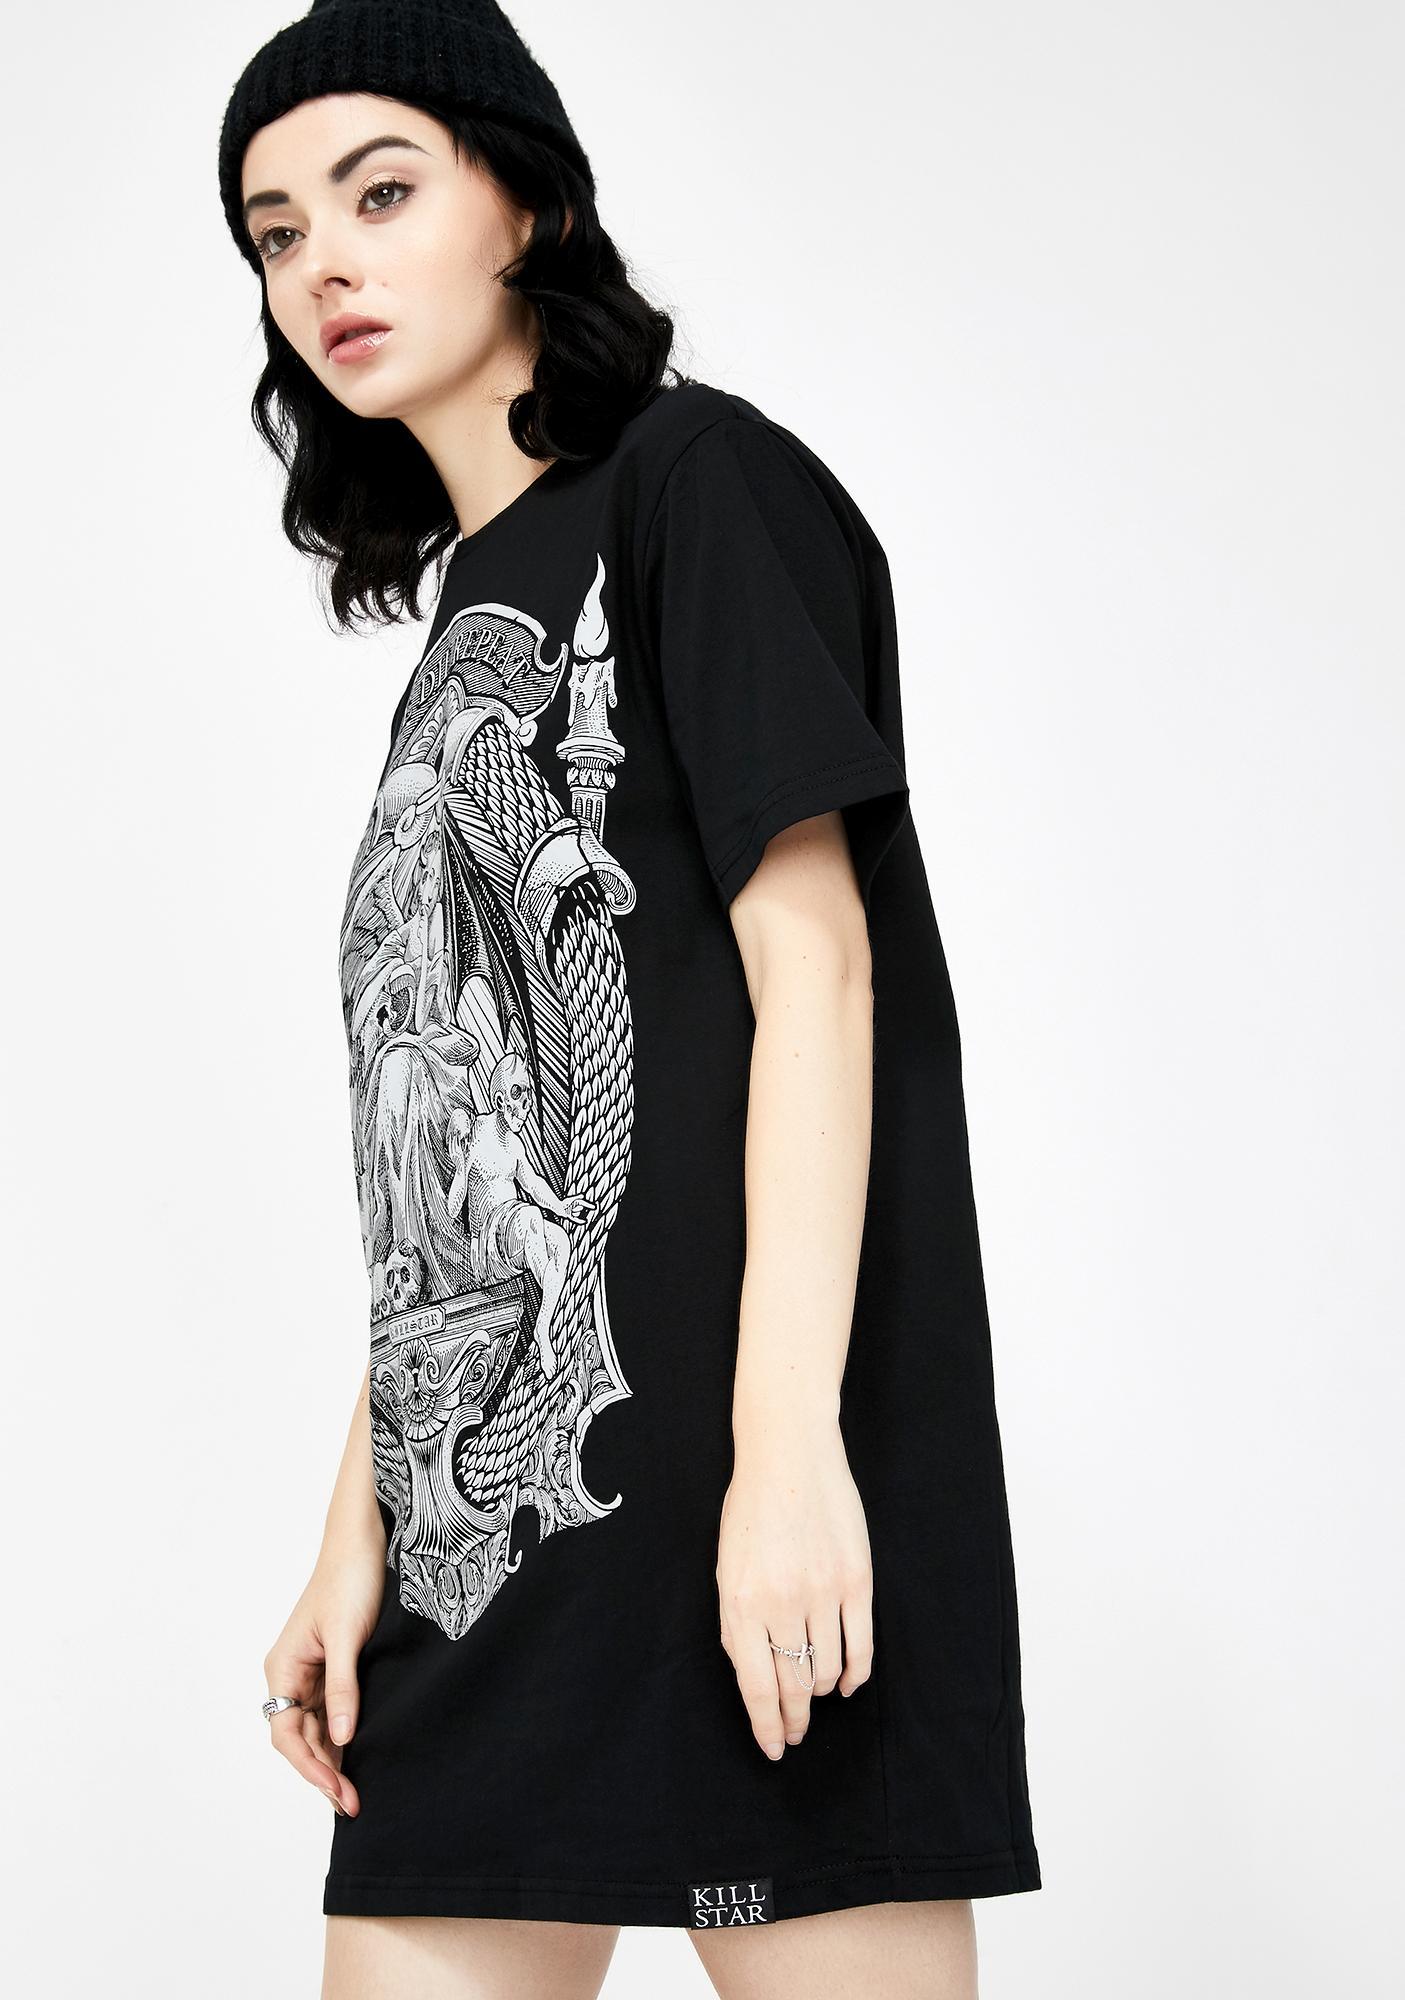 Killstar Matrix Graphic T-Shirt